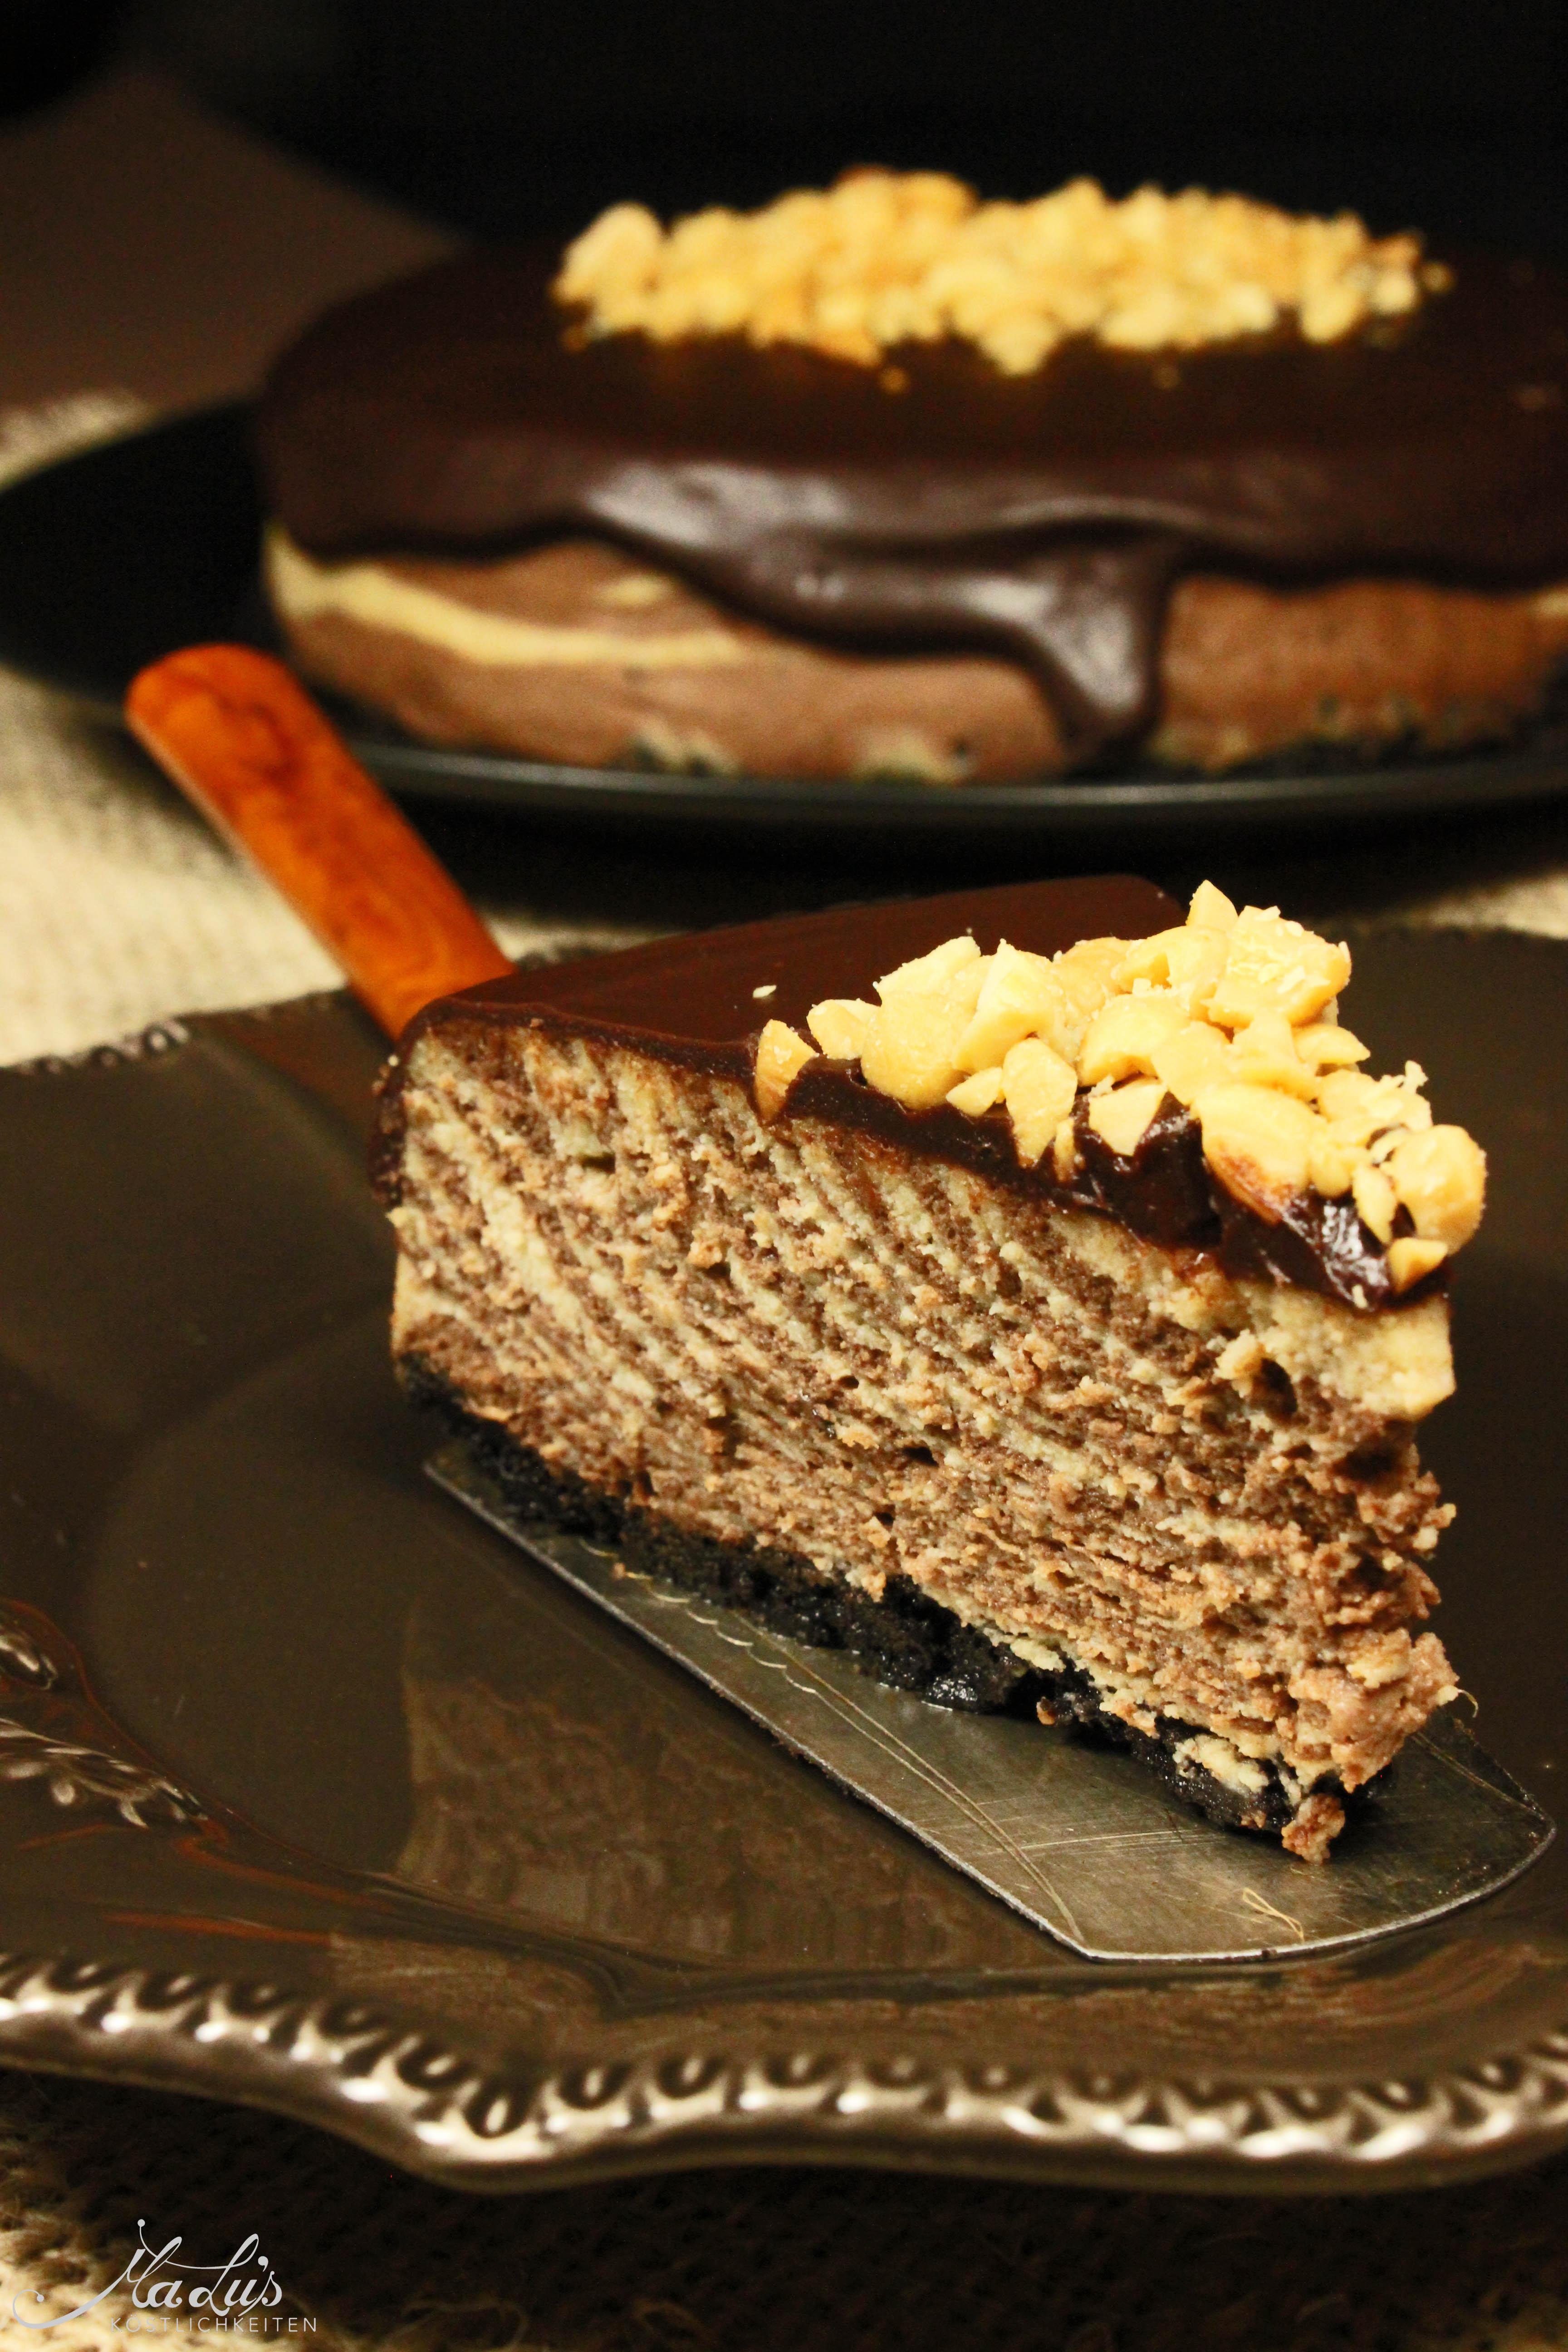 Chocolate-Peanutbutter Cheesecake